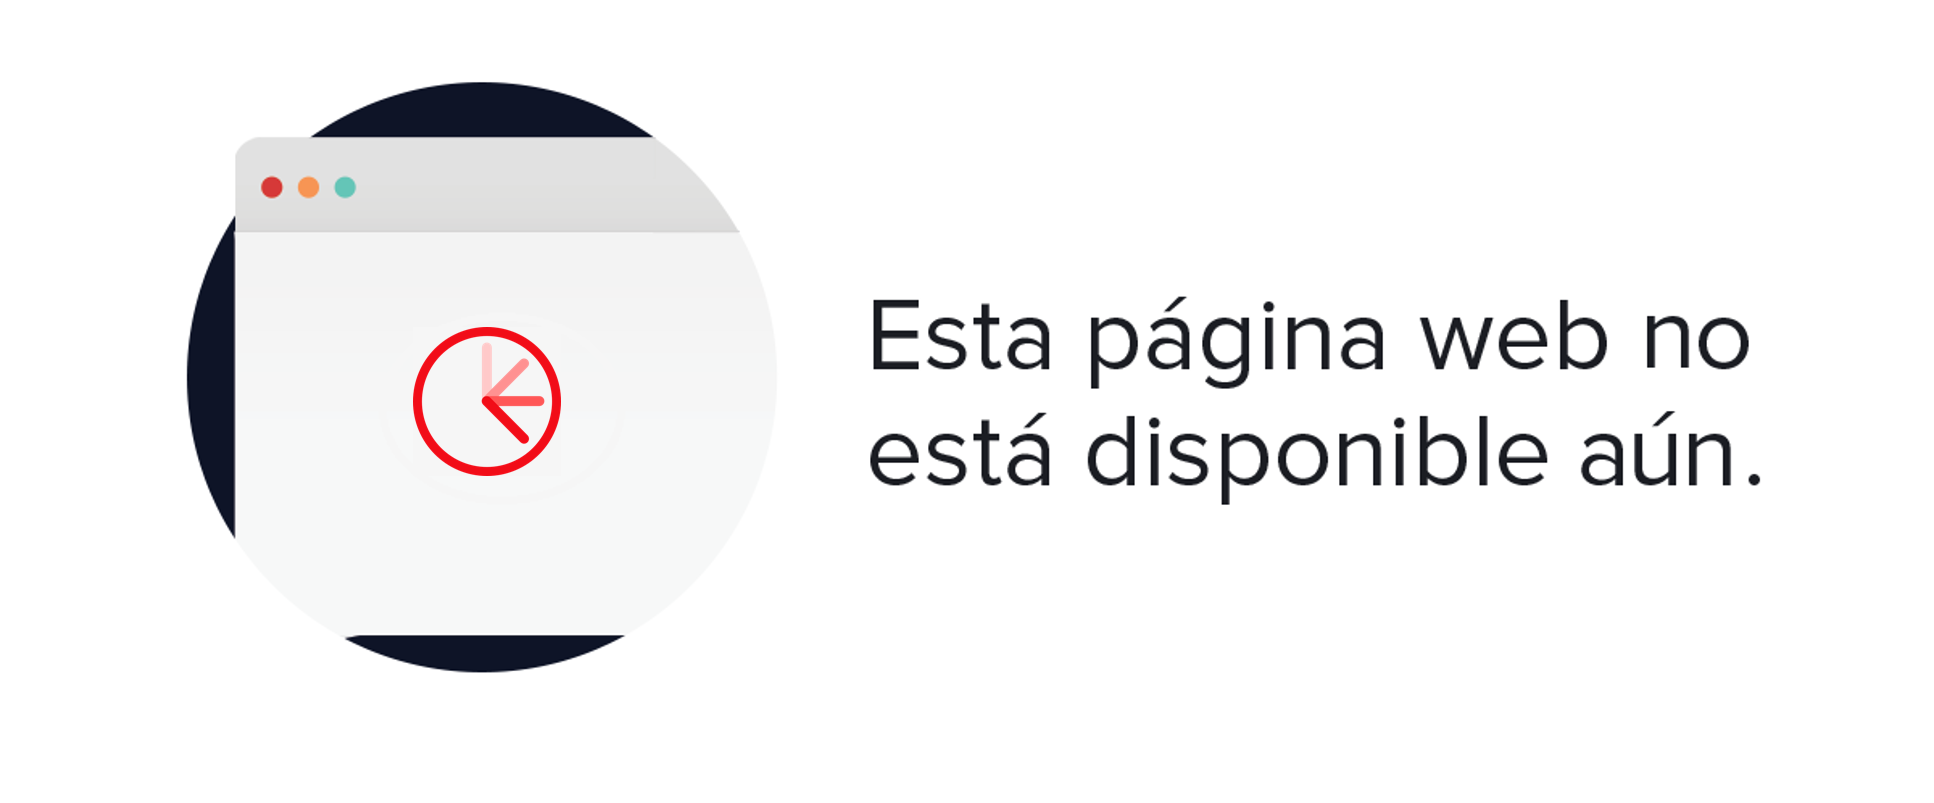 Giuseppe Zanotti Blanco Zapatillas Deportivas Hombre 474646 - Barato - CNZJKFI